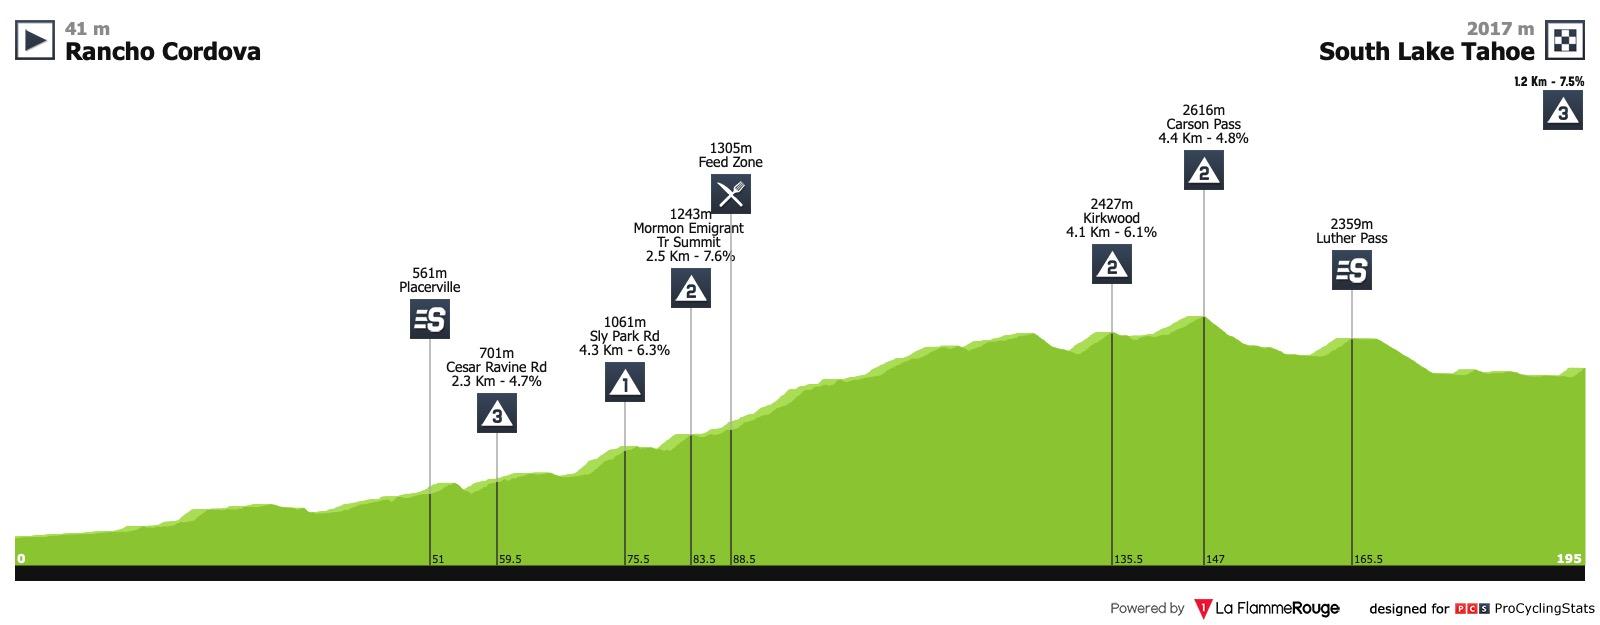 Amgen Tour of California 2019 Tour-of-california-2019-stage-2-profile-a13f044255